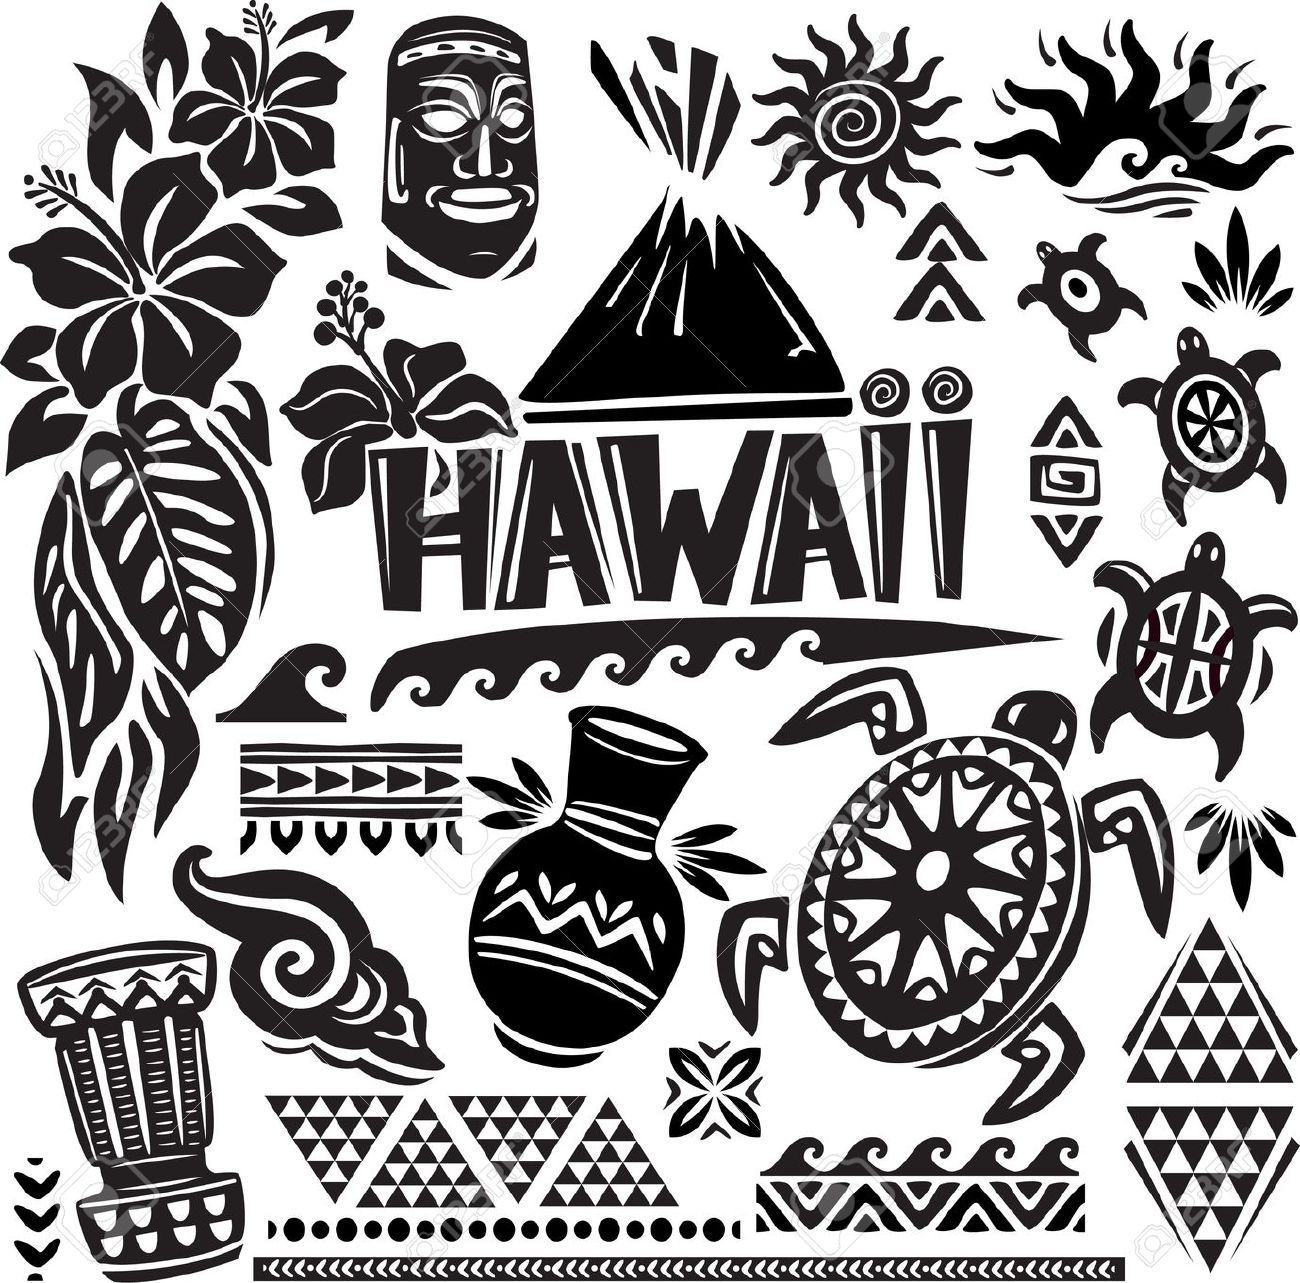 Hawaii black and white clipart banner transparent download hawaii set (hawaiian, tribal, hawaii clipart | Logos and Fonts in ... banner transparent download